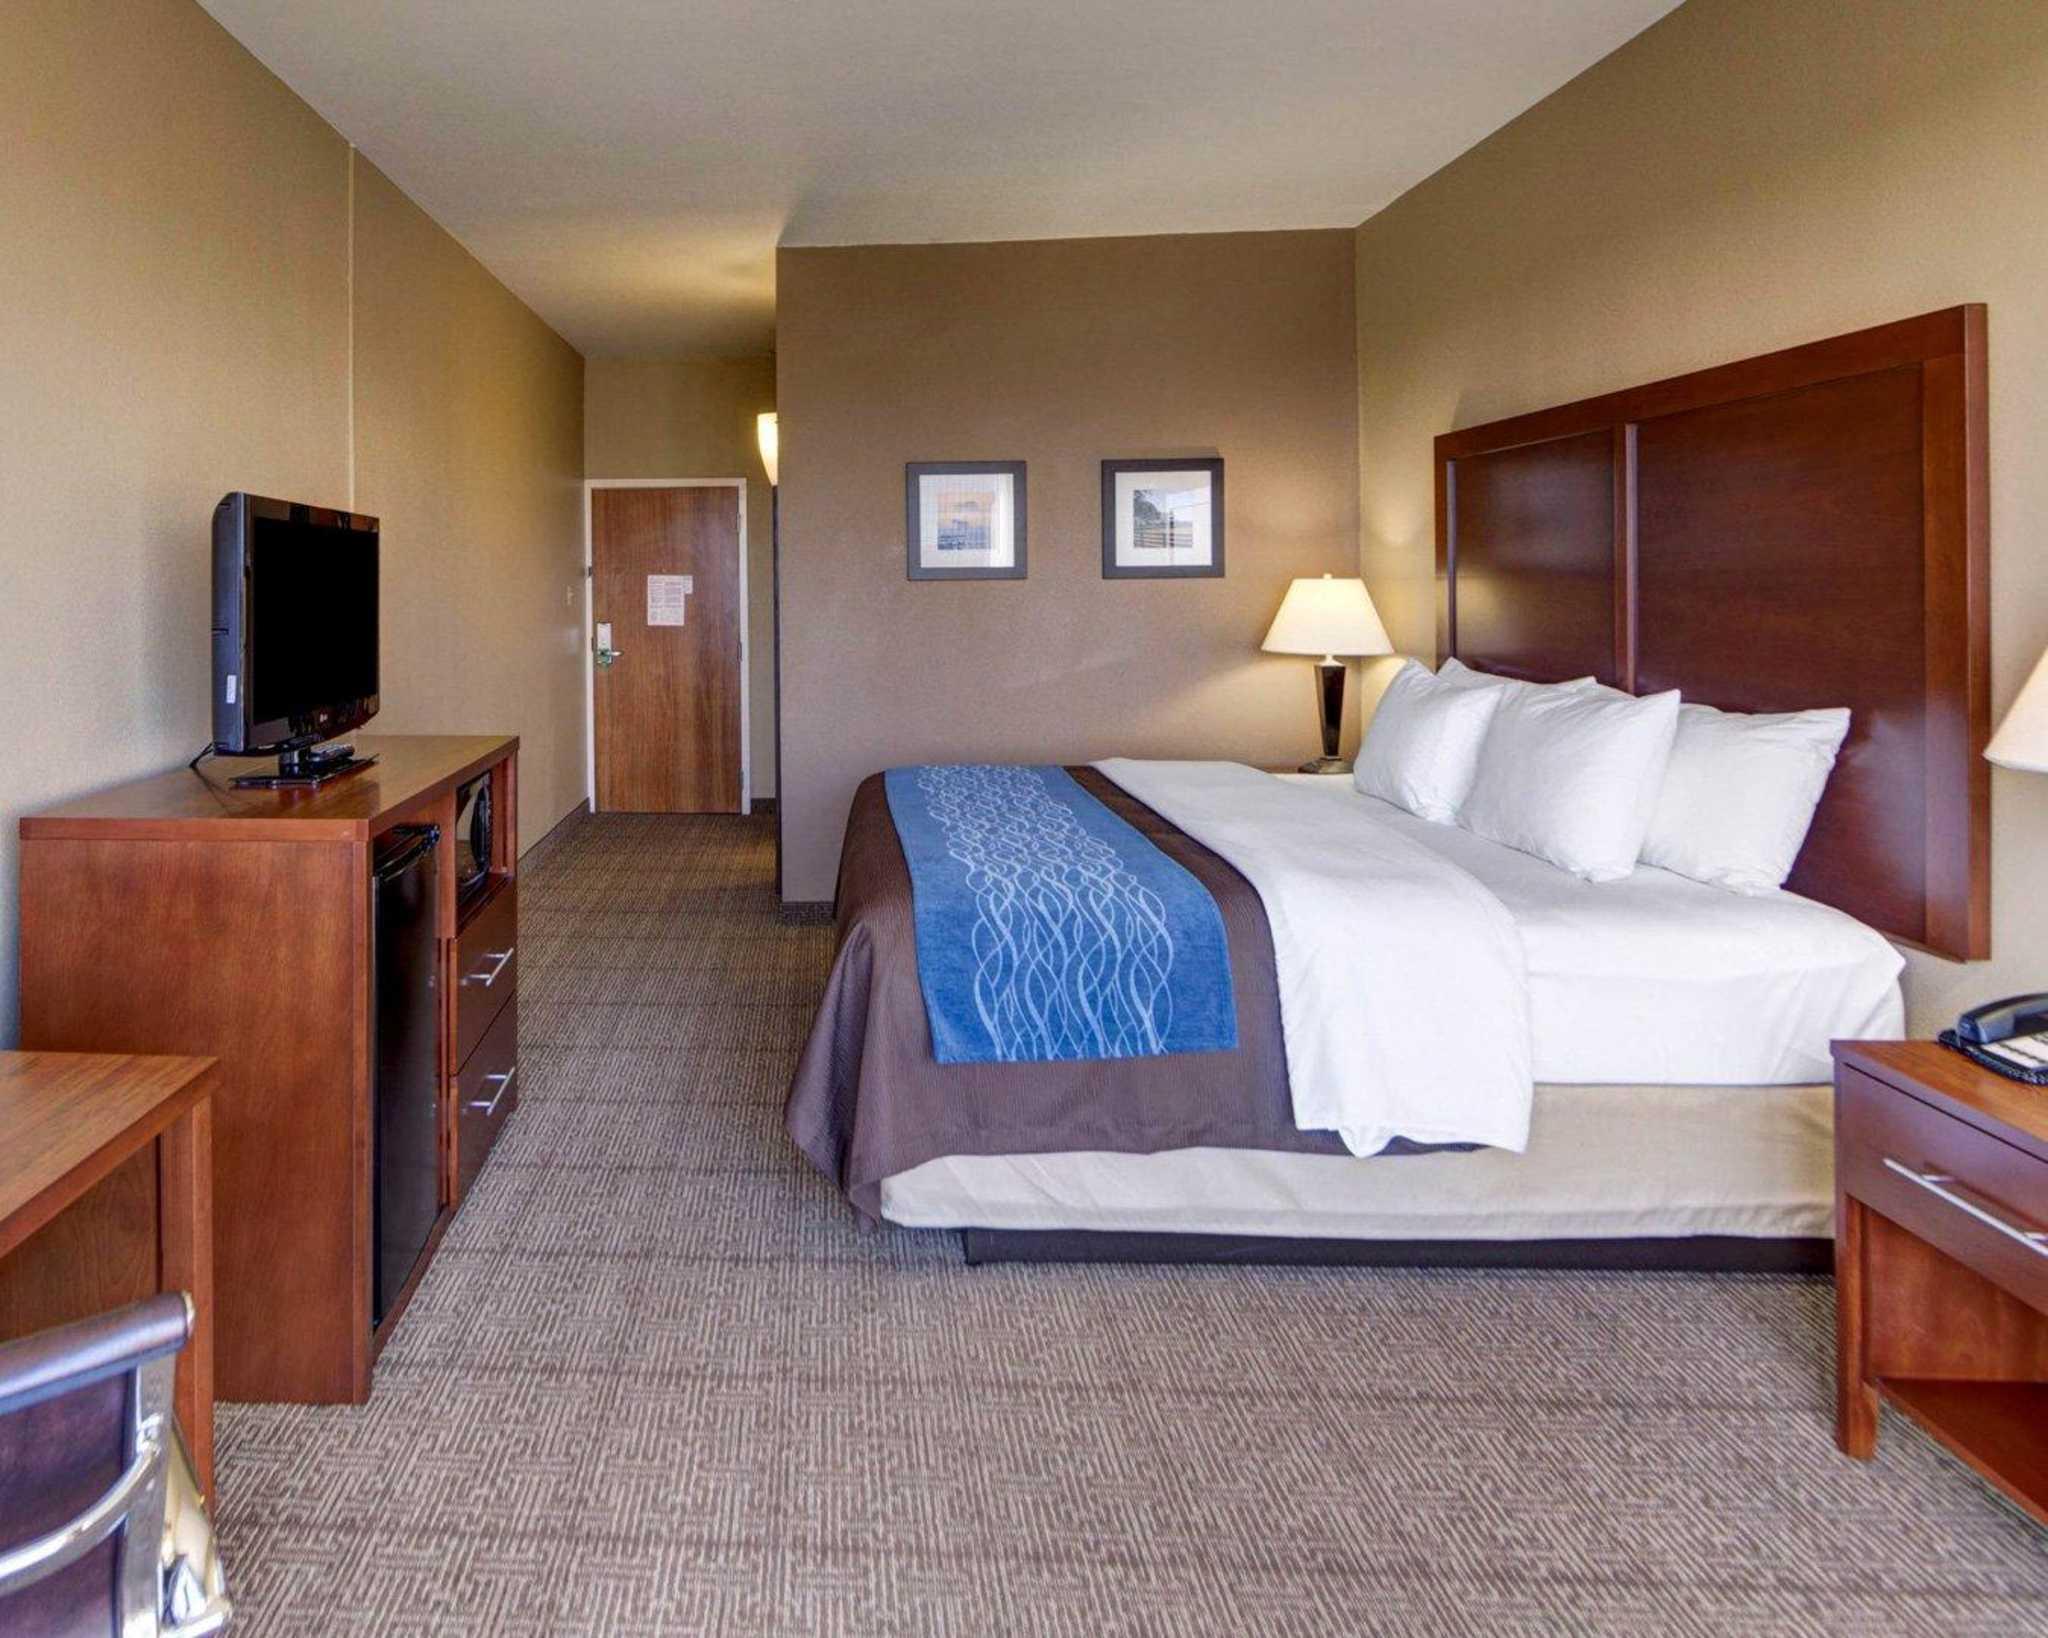 Comfort Inn & Suites Plano East image 7